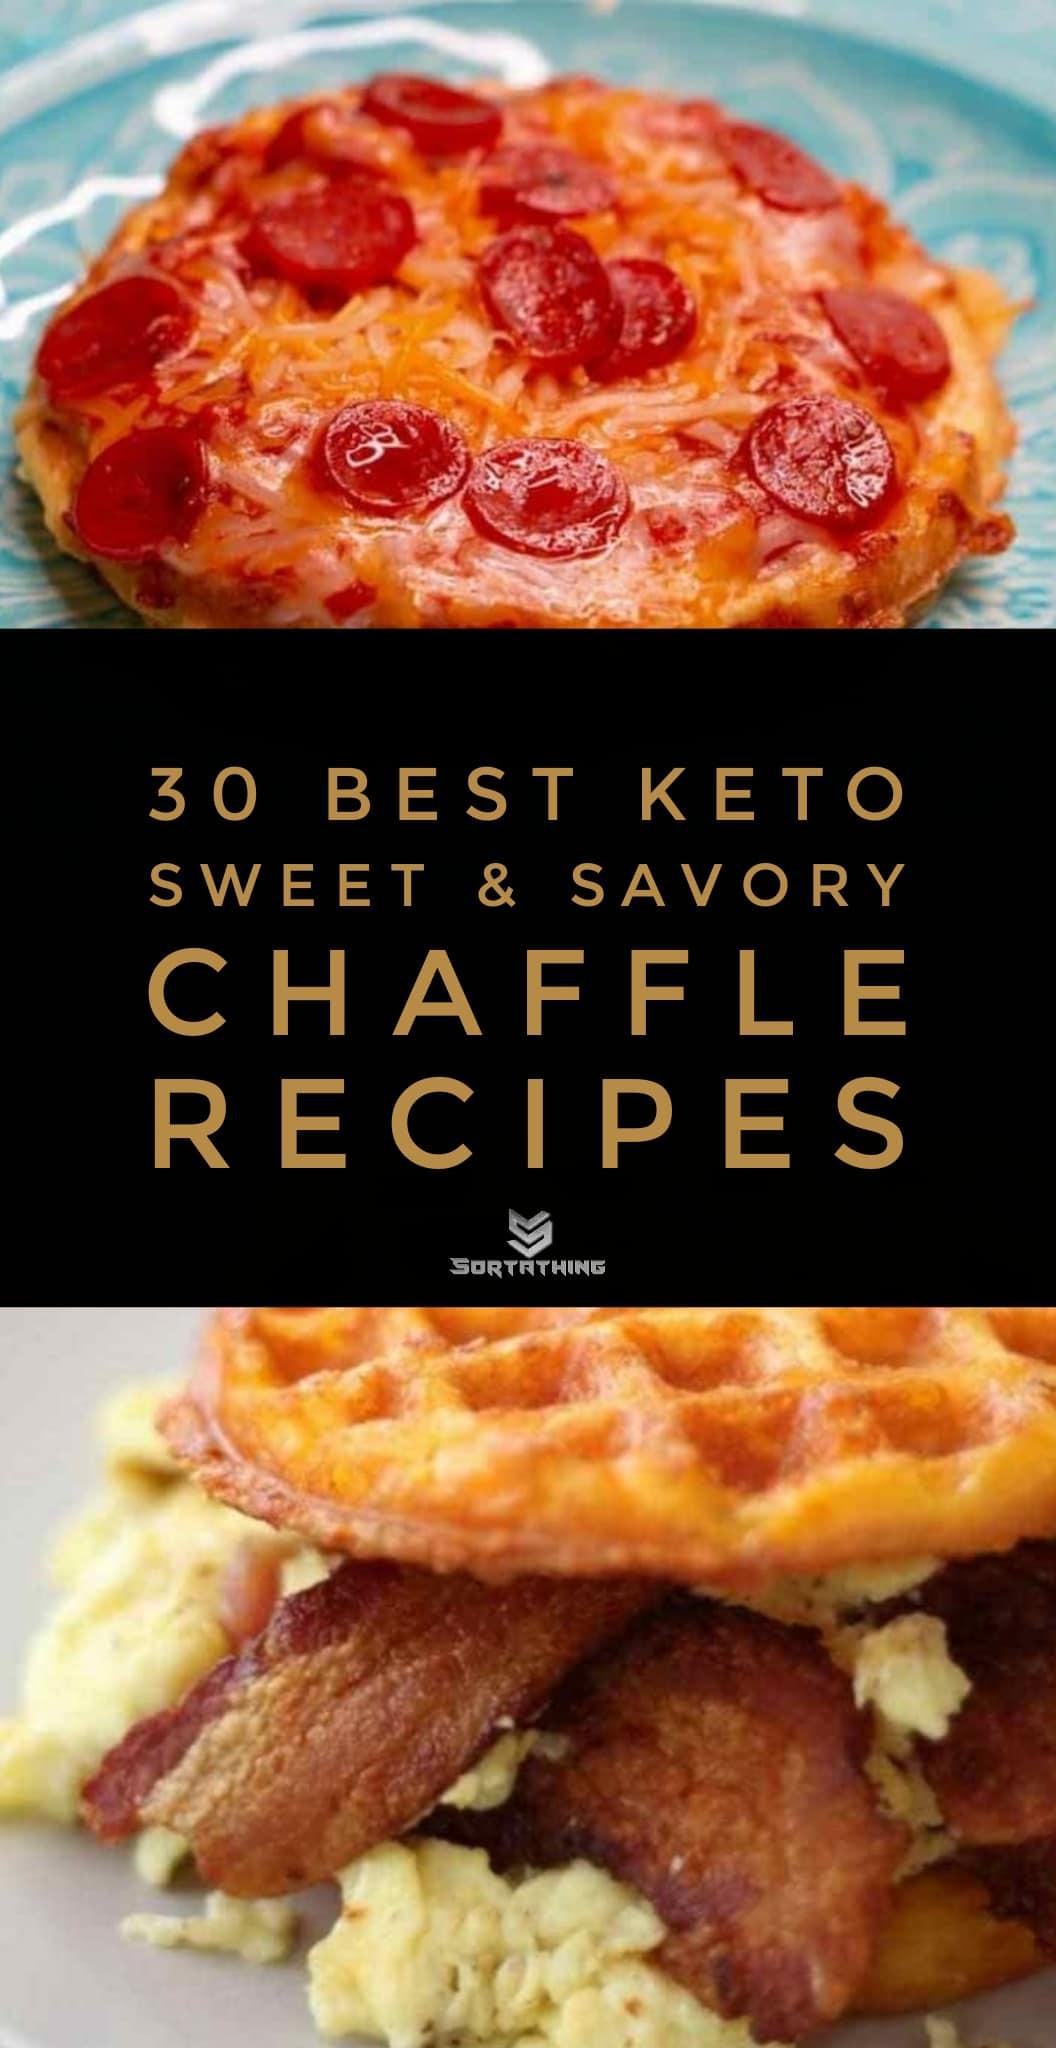 Keto Pizza Chaffle and Chaffle Breakfast Sandwich Bread